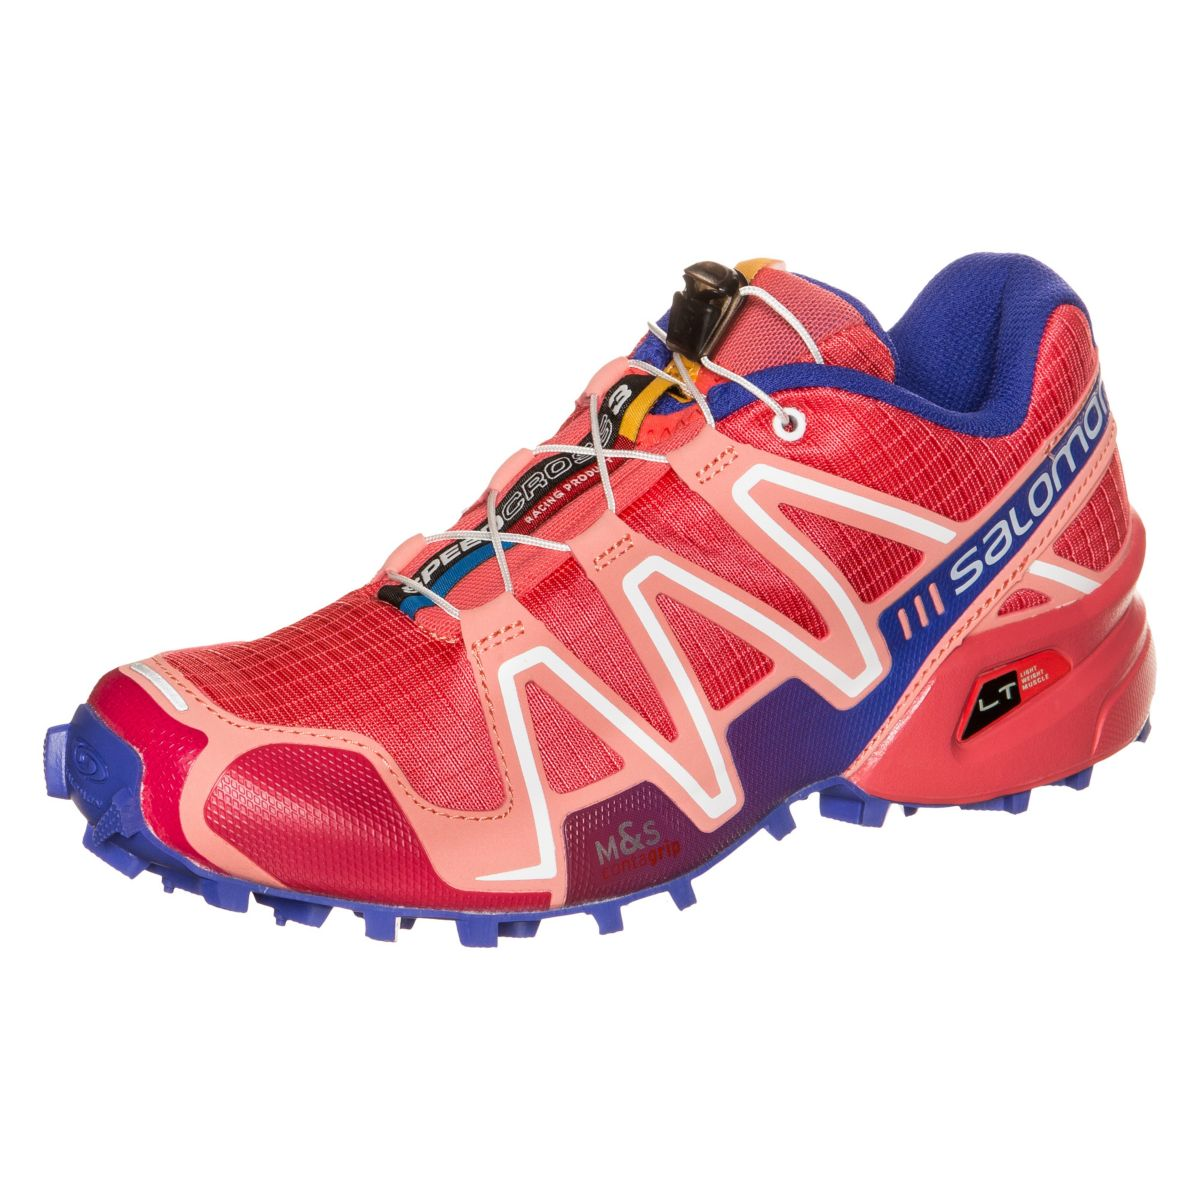 Salomon Speedcross 3 Trail Laufschuh Damen